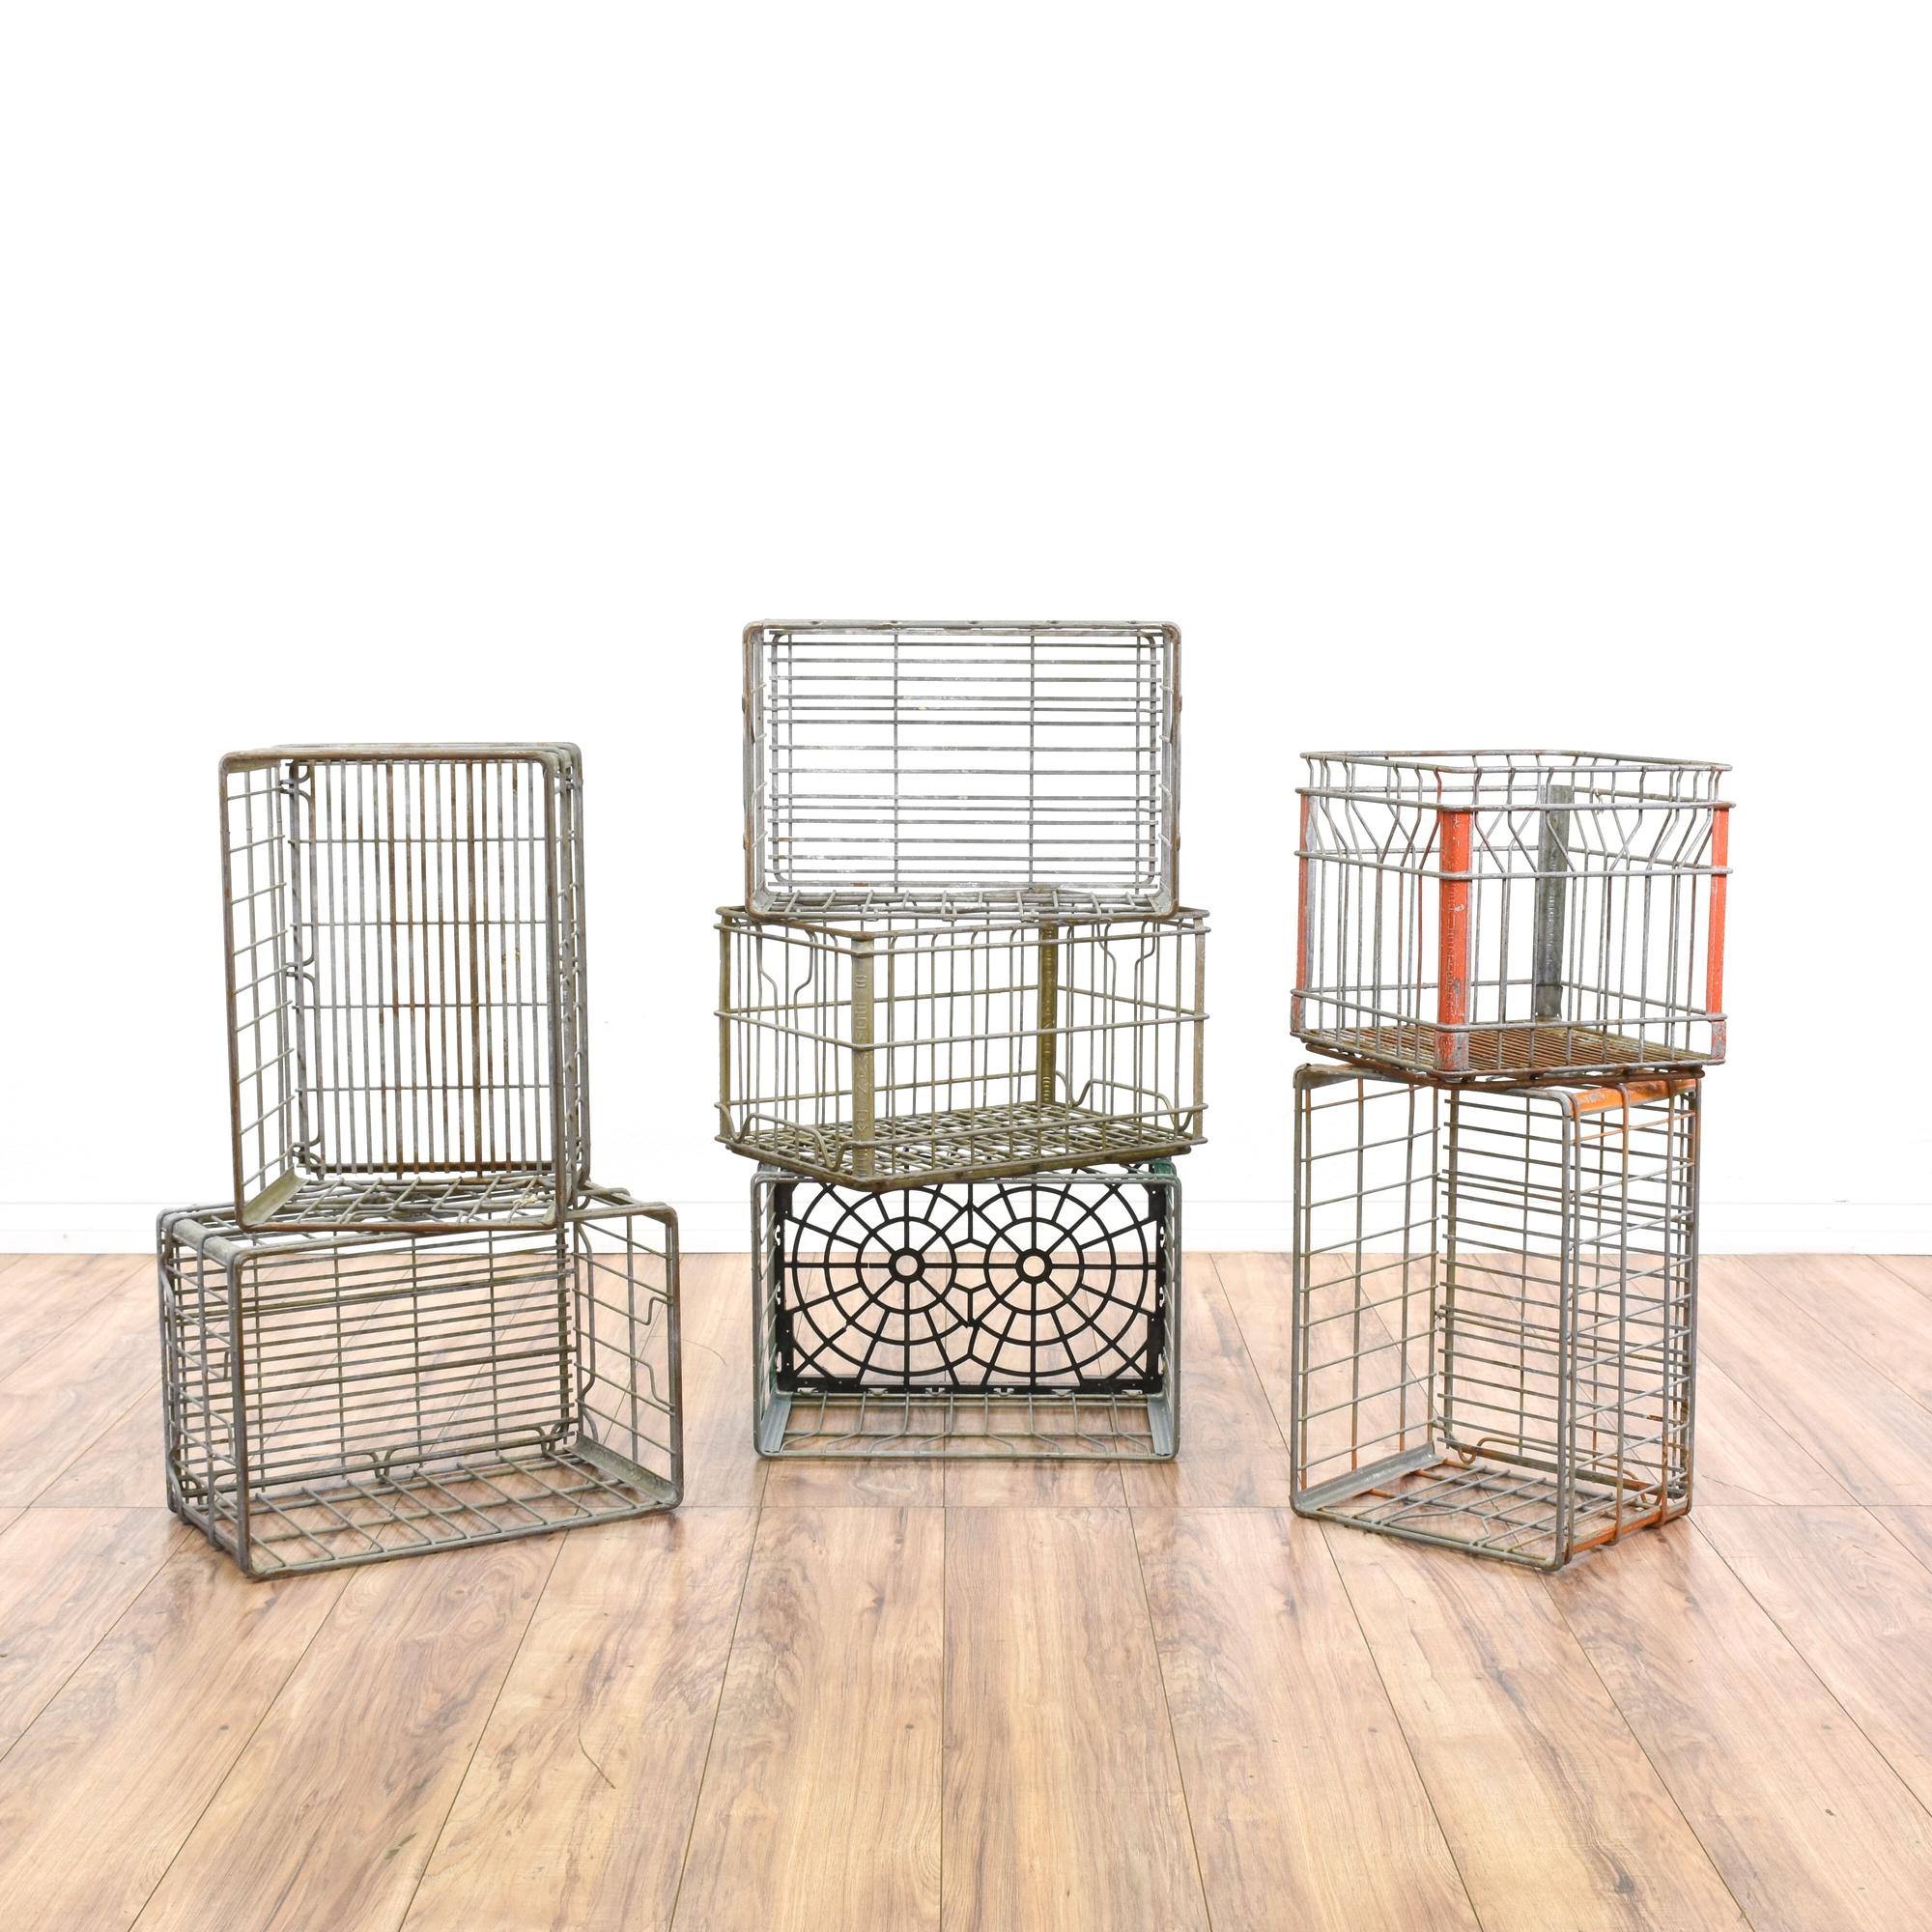 Basket Making Supplies San Diego : Rustic wire rectangular basket milk crate loveseat